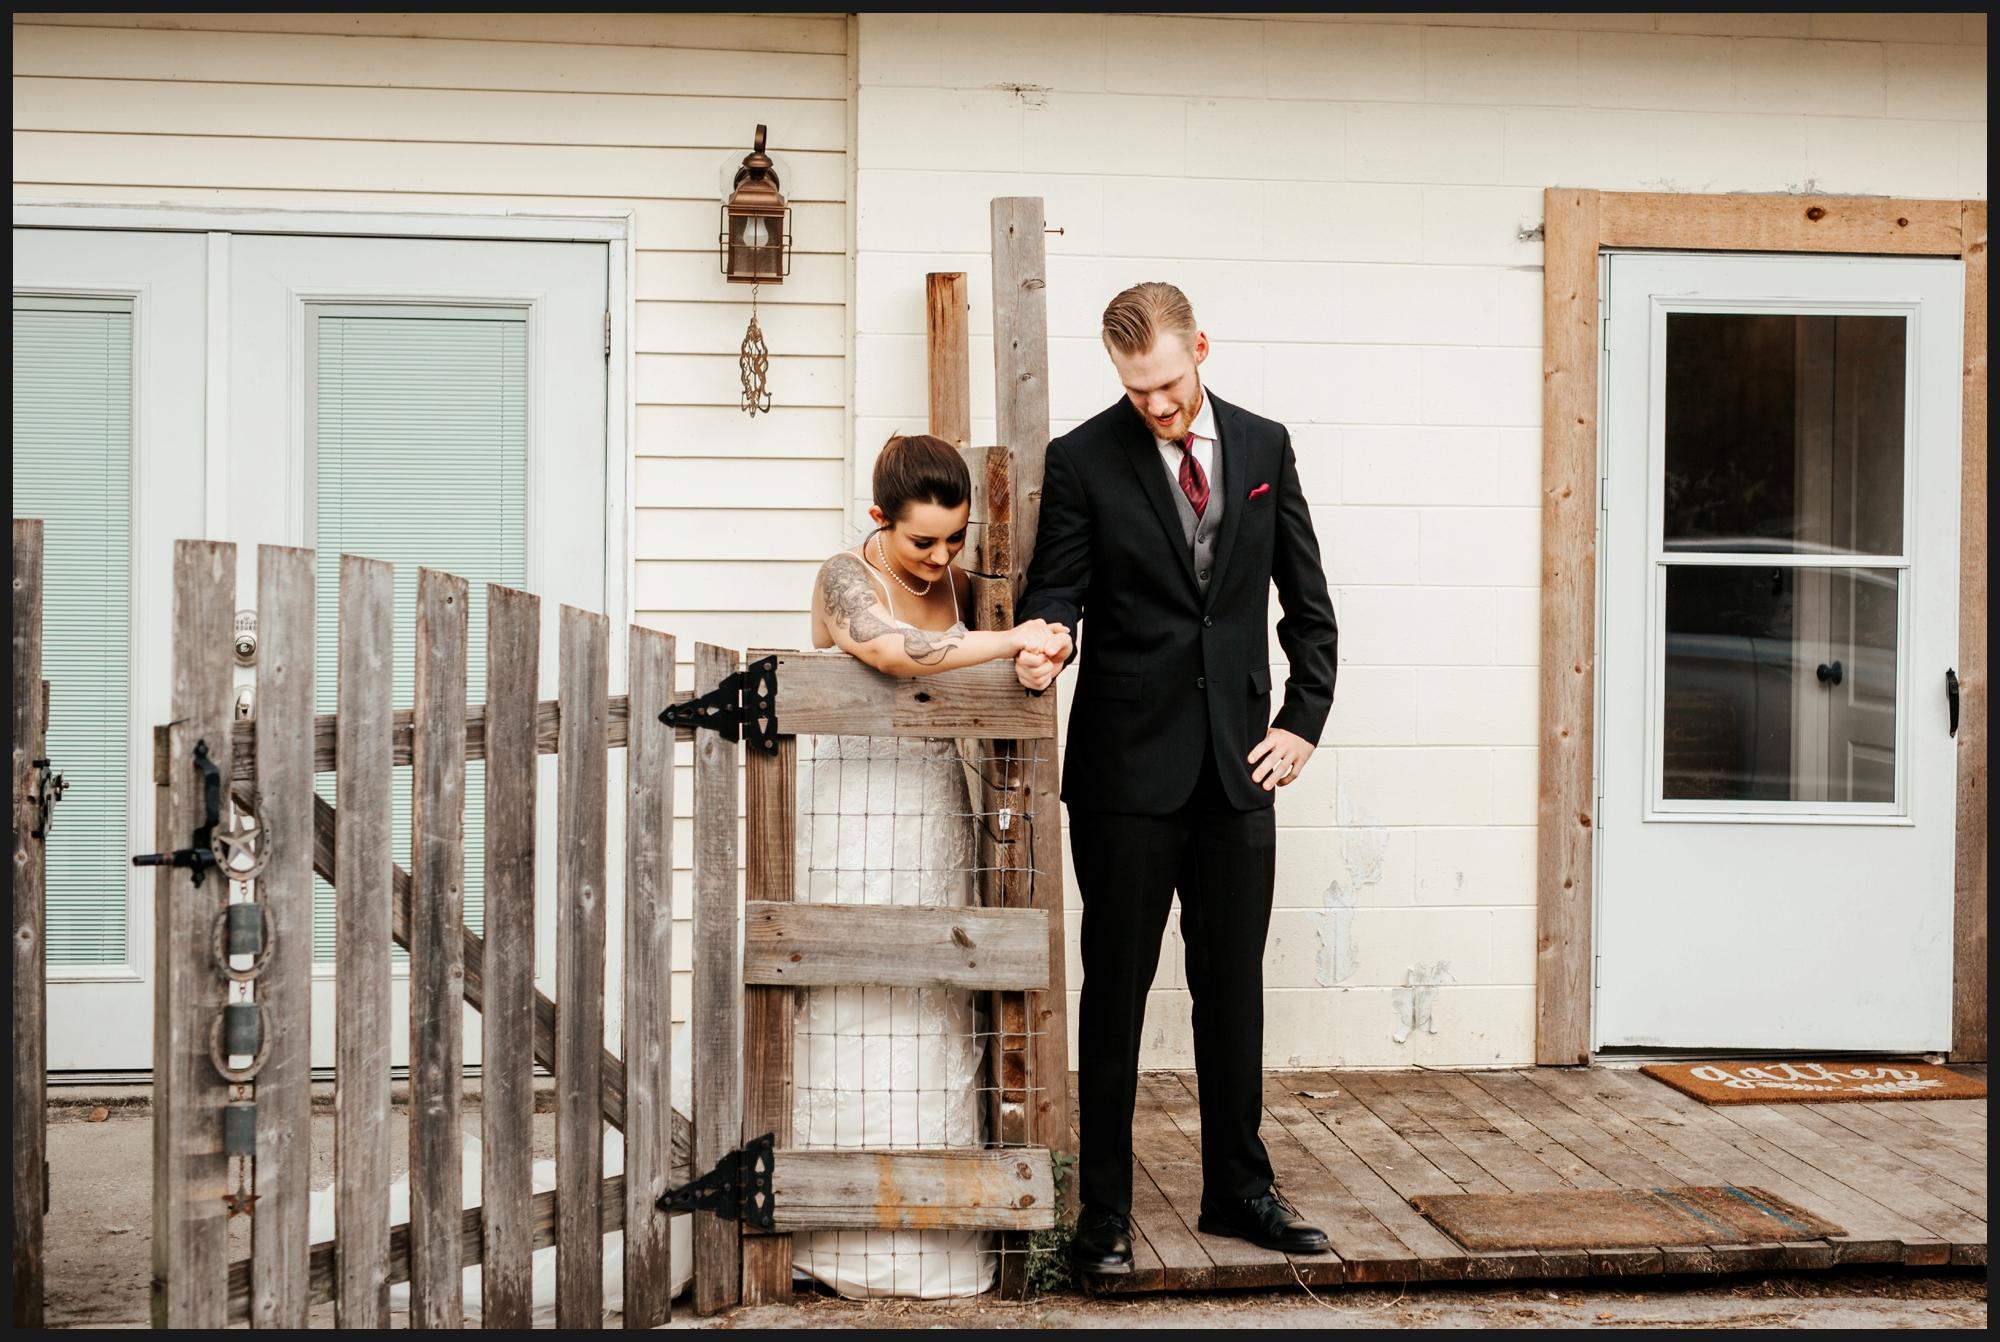 Orlando-Wedding-Photographer-destination-wedding-photographer-florida-wedding-photographer-bohemian-wedding-photographer_0332.jpg